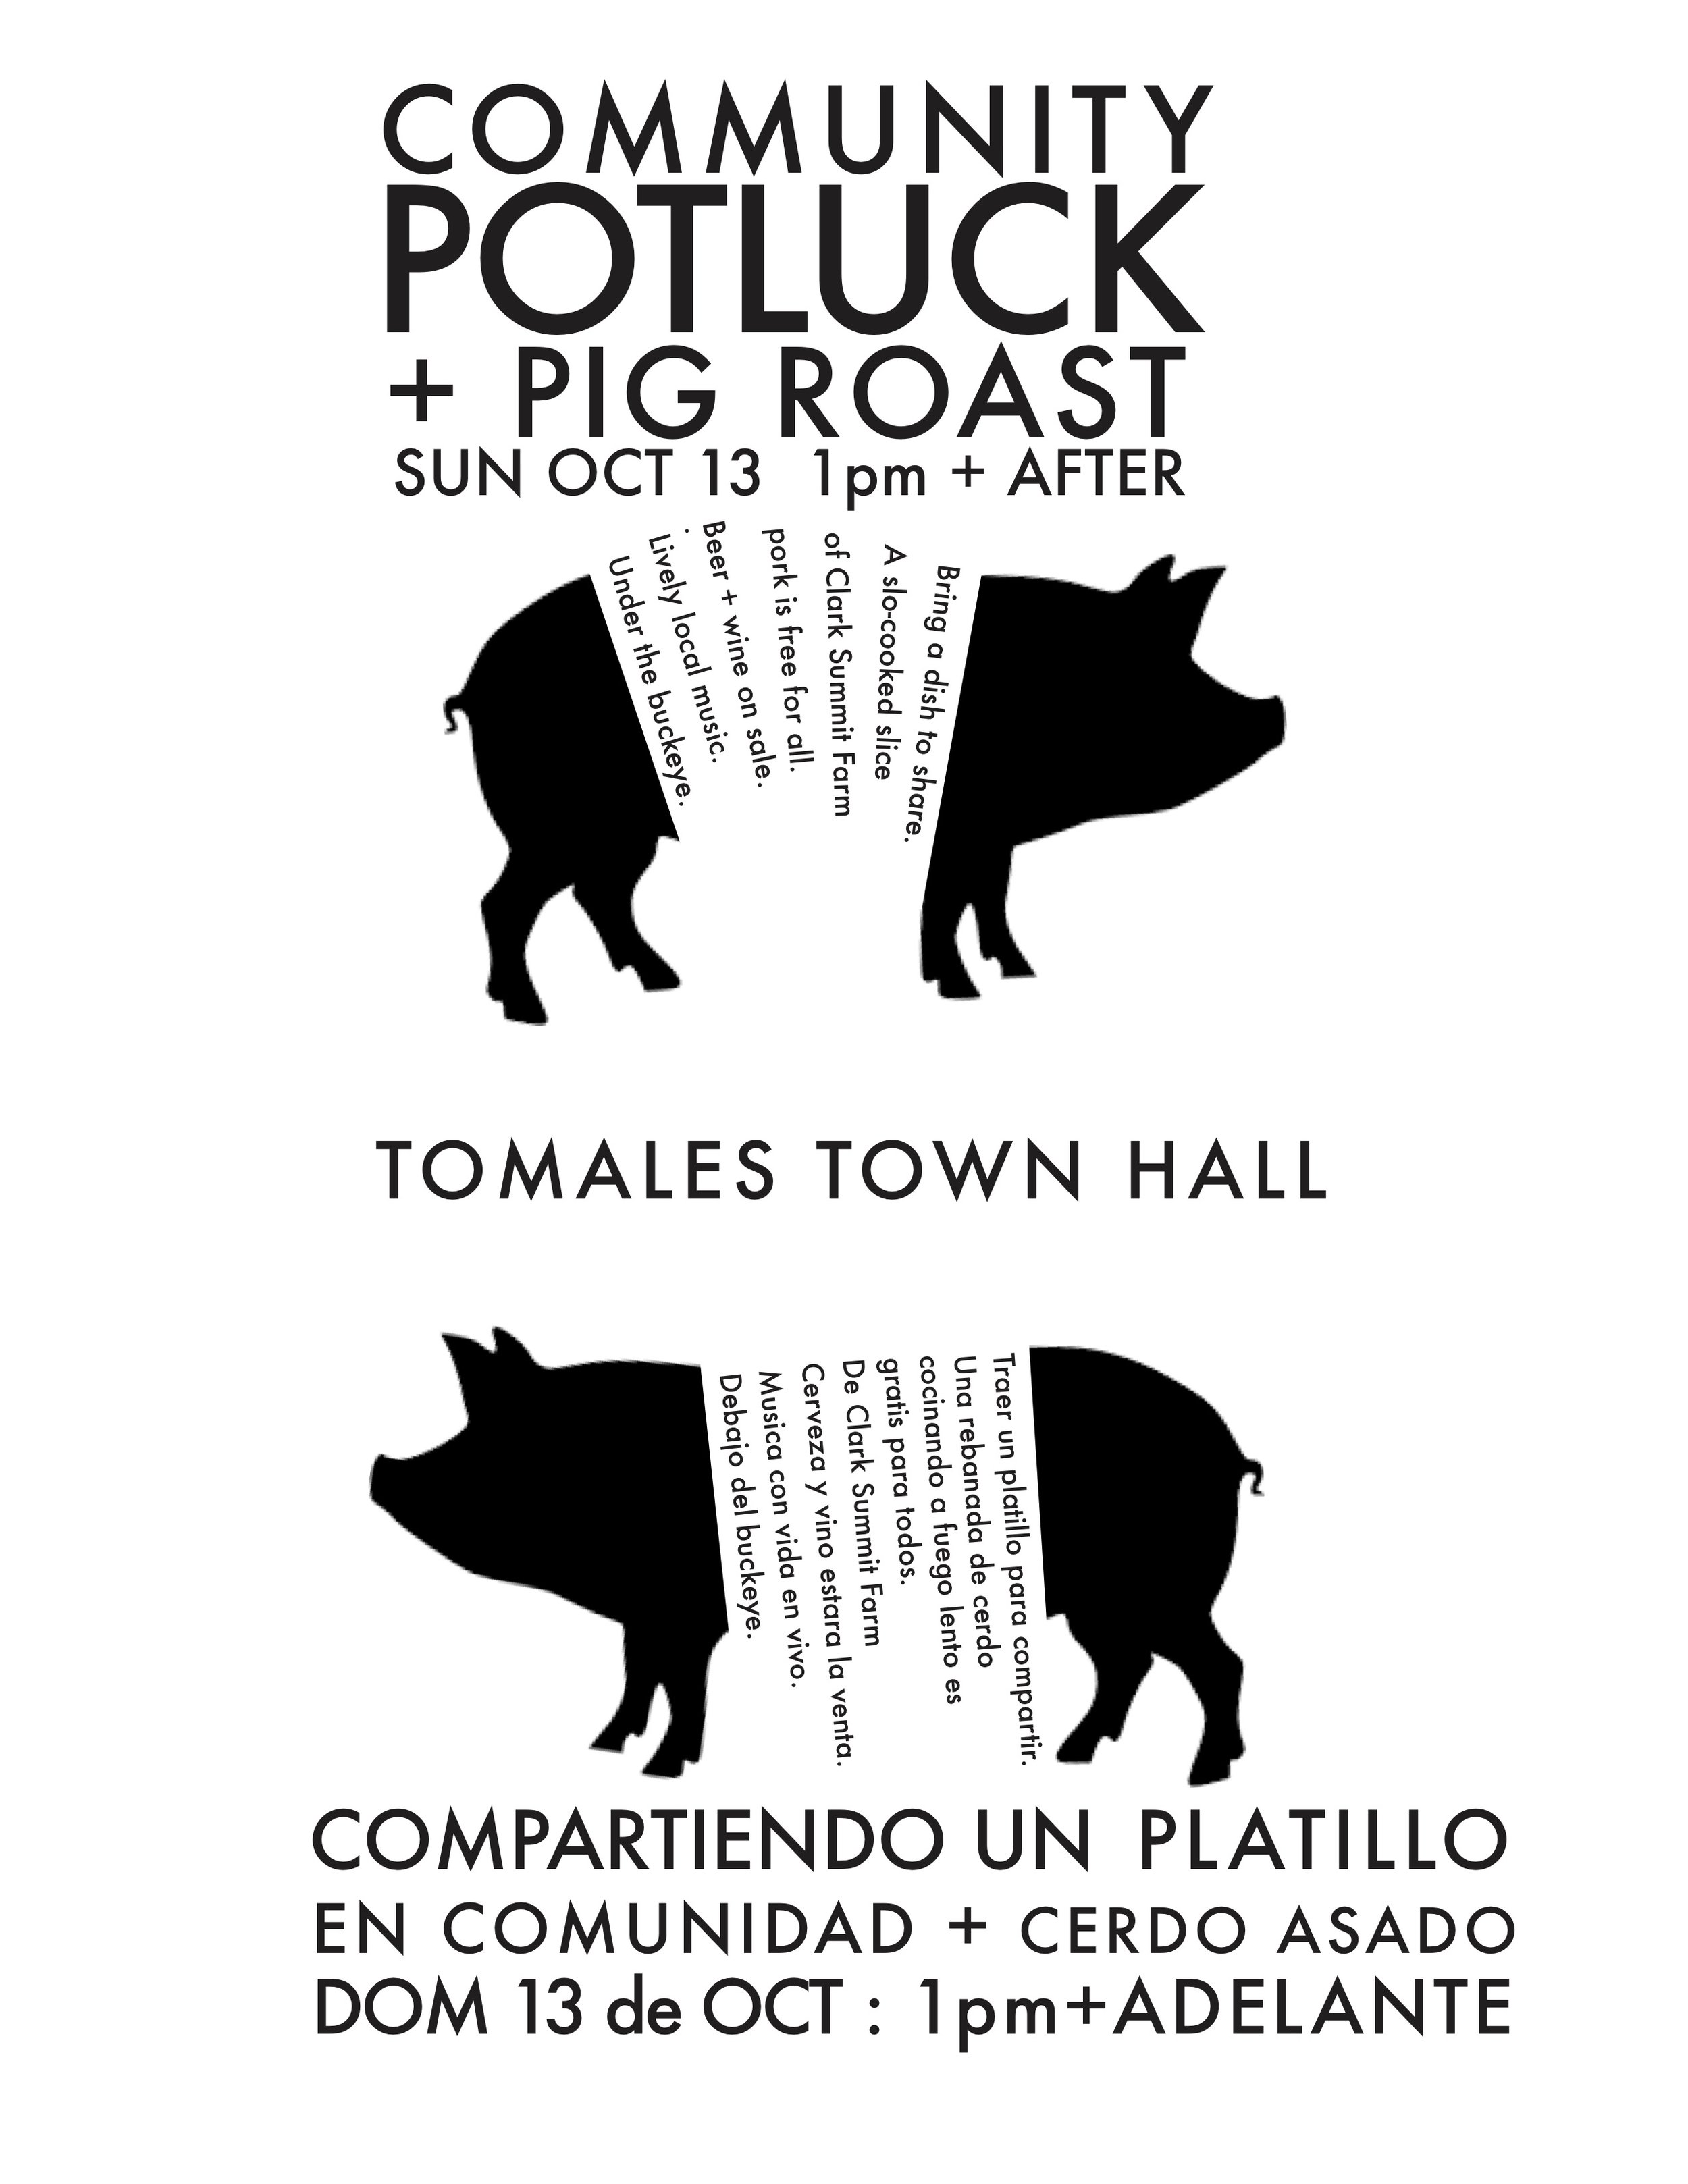 patio-PIG-potluck-2019.jpg